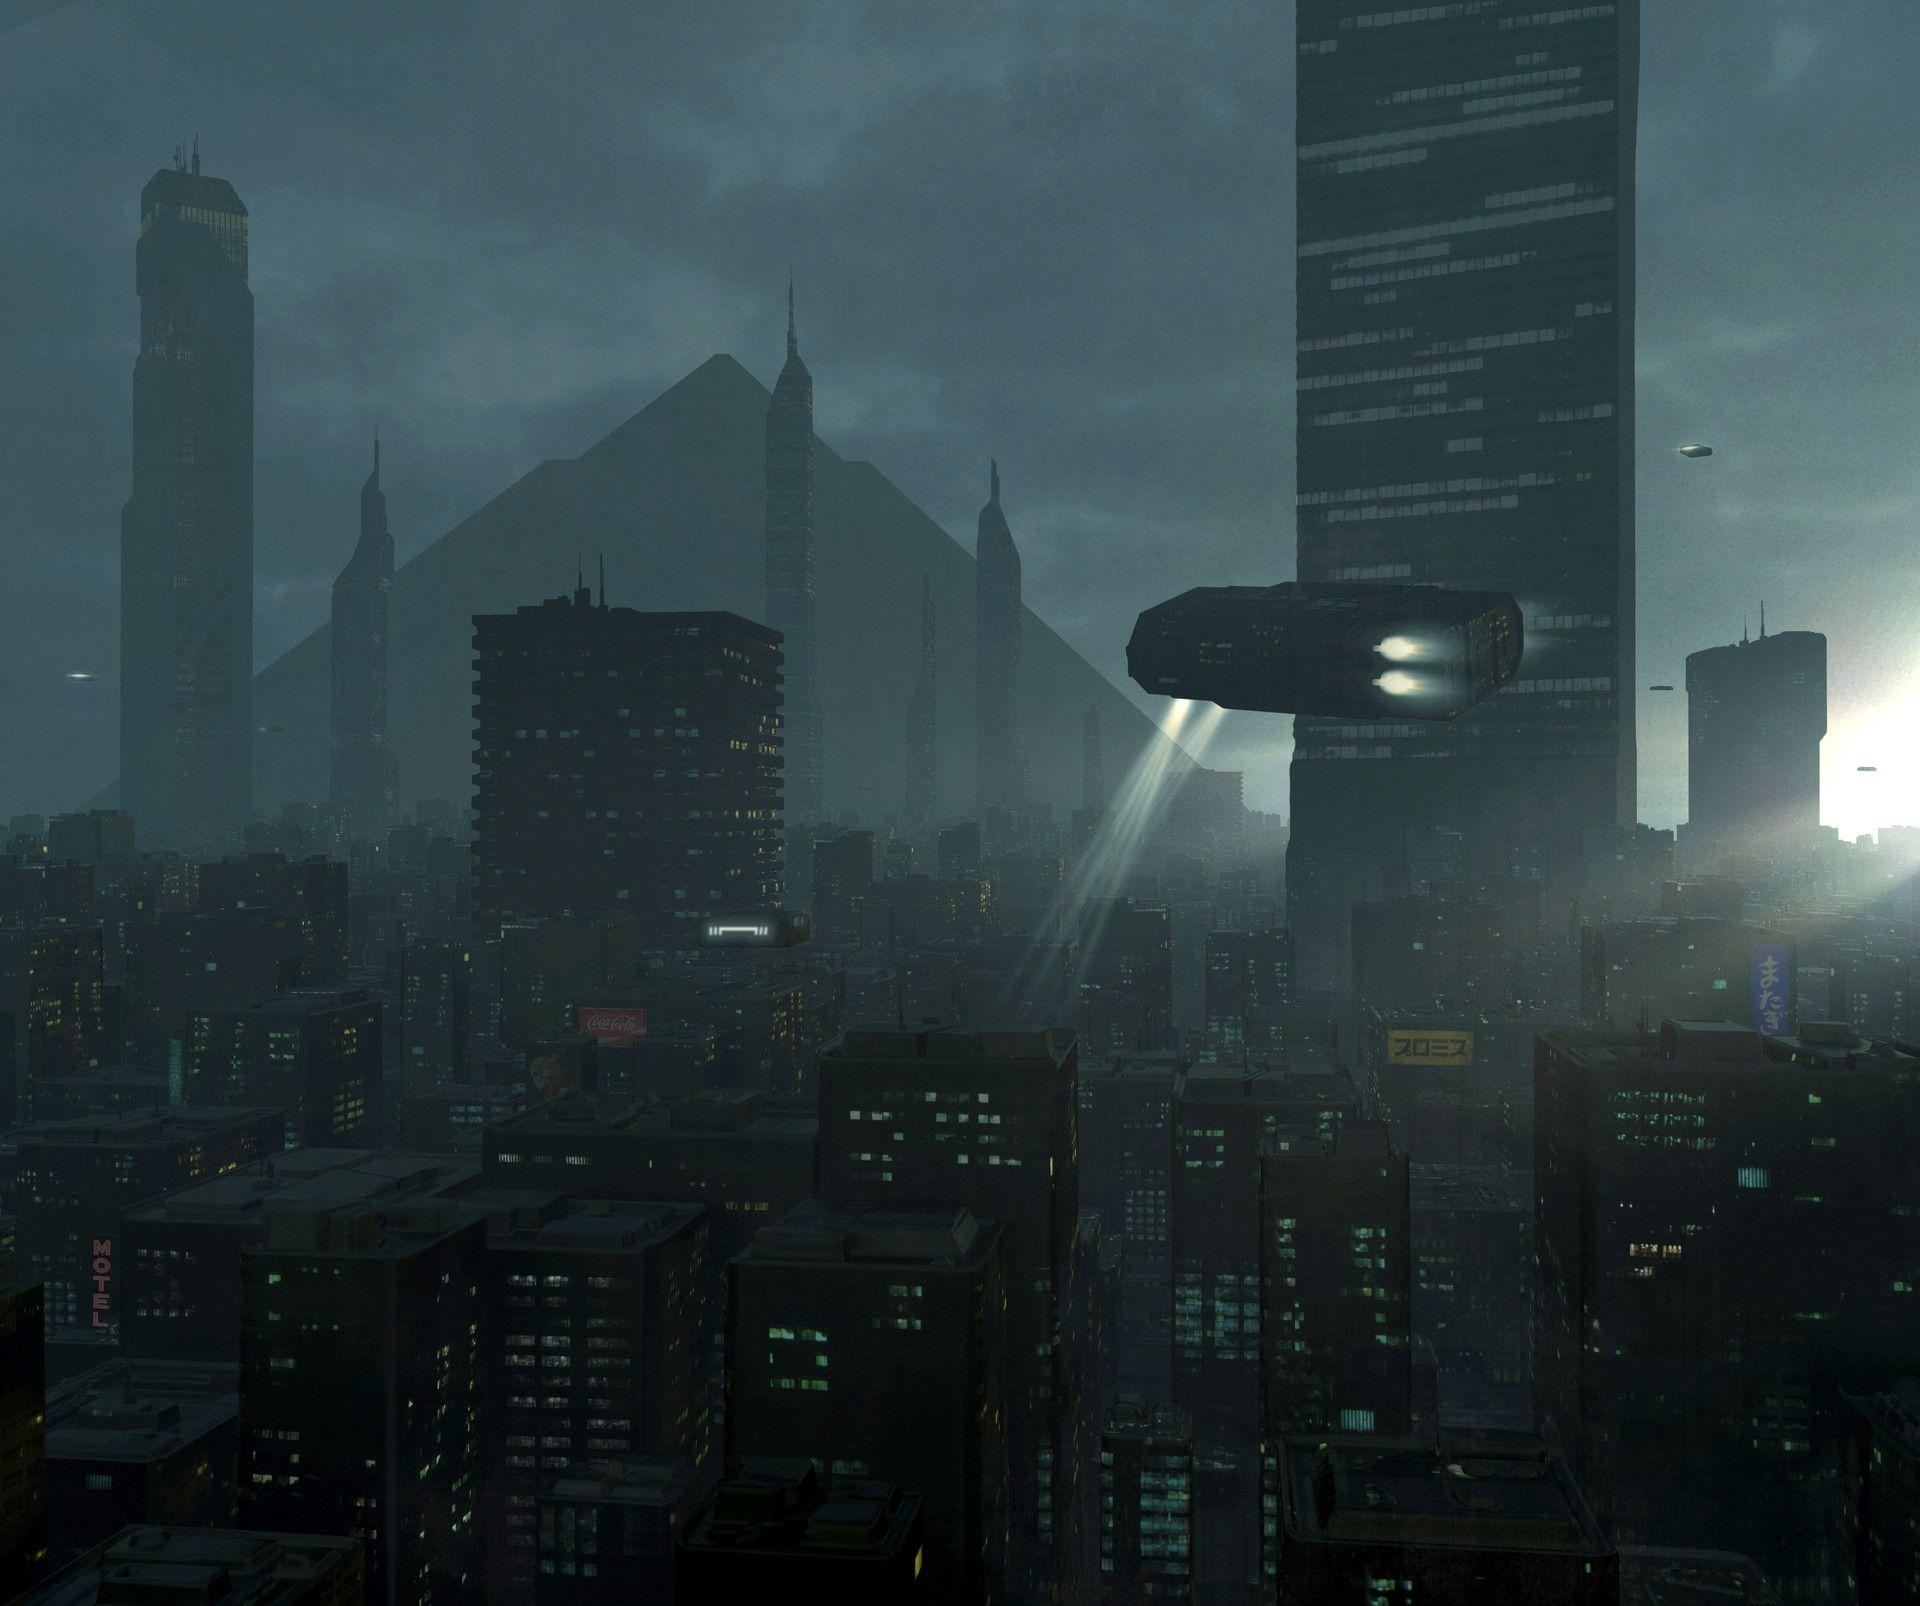 ArtStation - Near future. mosstree 2 | Science fiction artwork. Cyberpunk city. Sci fi city